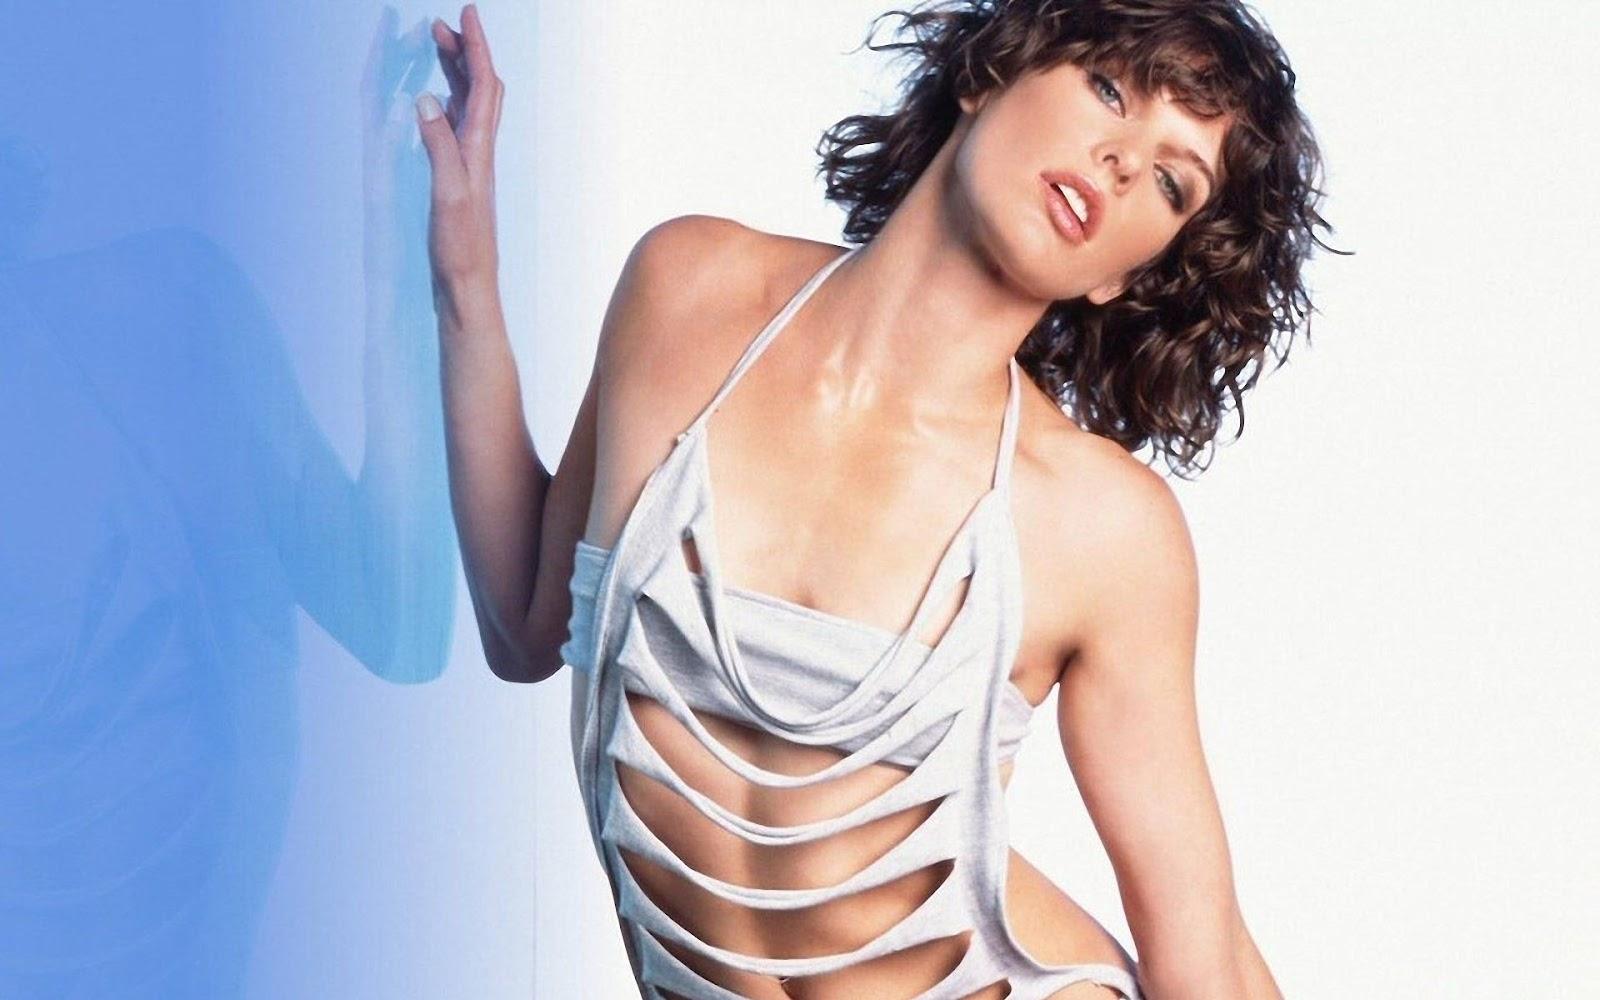 http://4.bp.blogspot.com/-TwYwYBwD9bM/UB-WRgdUZcI/AAAAAAAALXQ/vNtE793-CLY/s1600/milla-jovovich-sexy.jpg